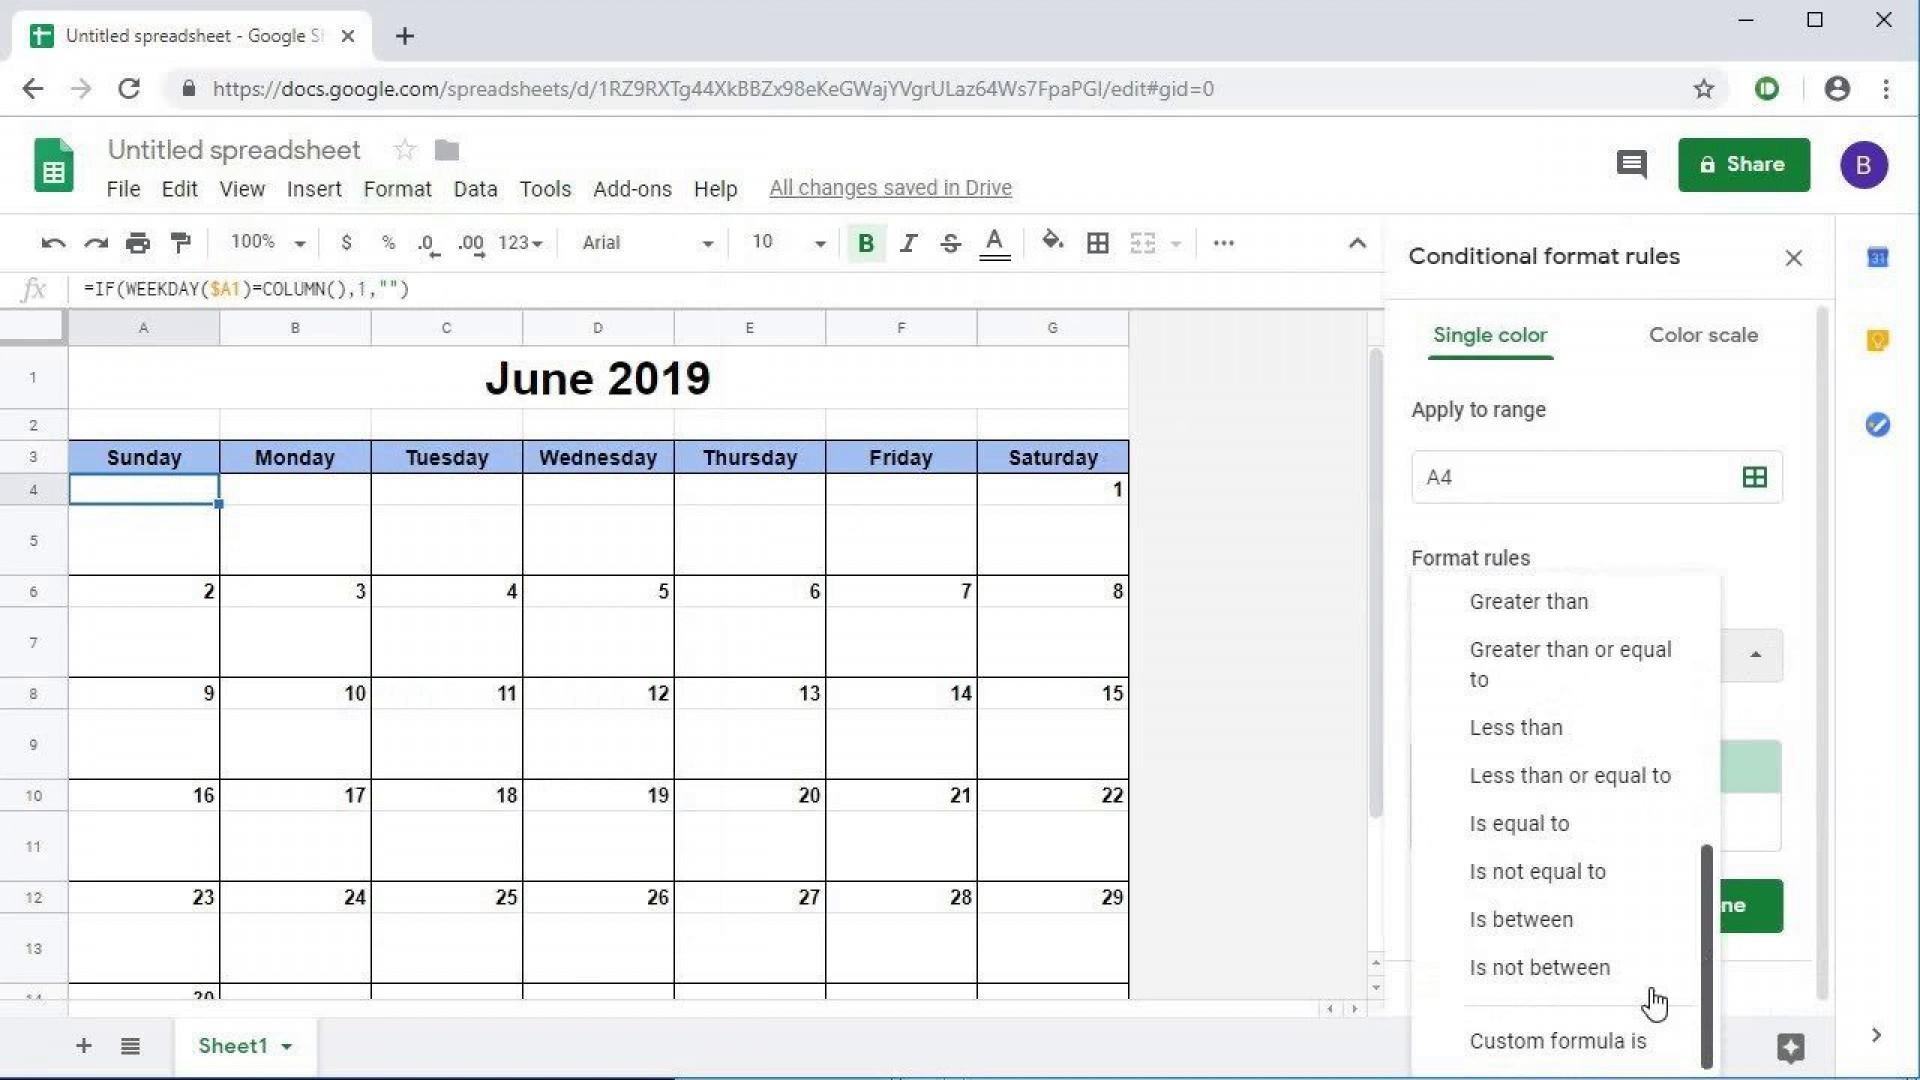 009 Frightening Google Sheet Calendar Template Image  Templates Monthly Spreadsheet 2020 20181920